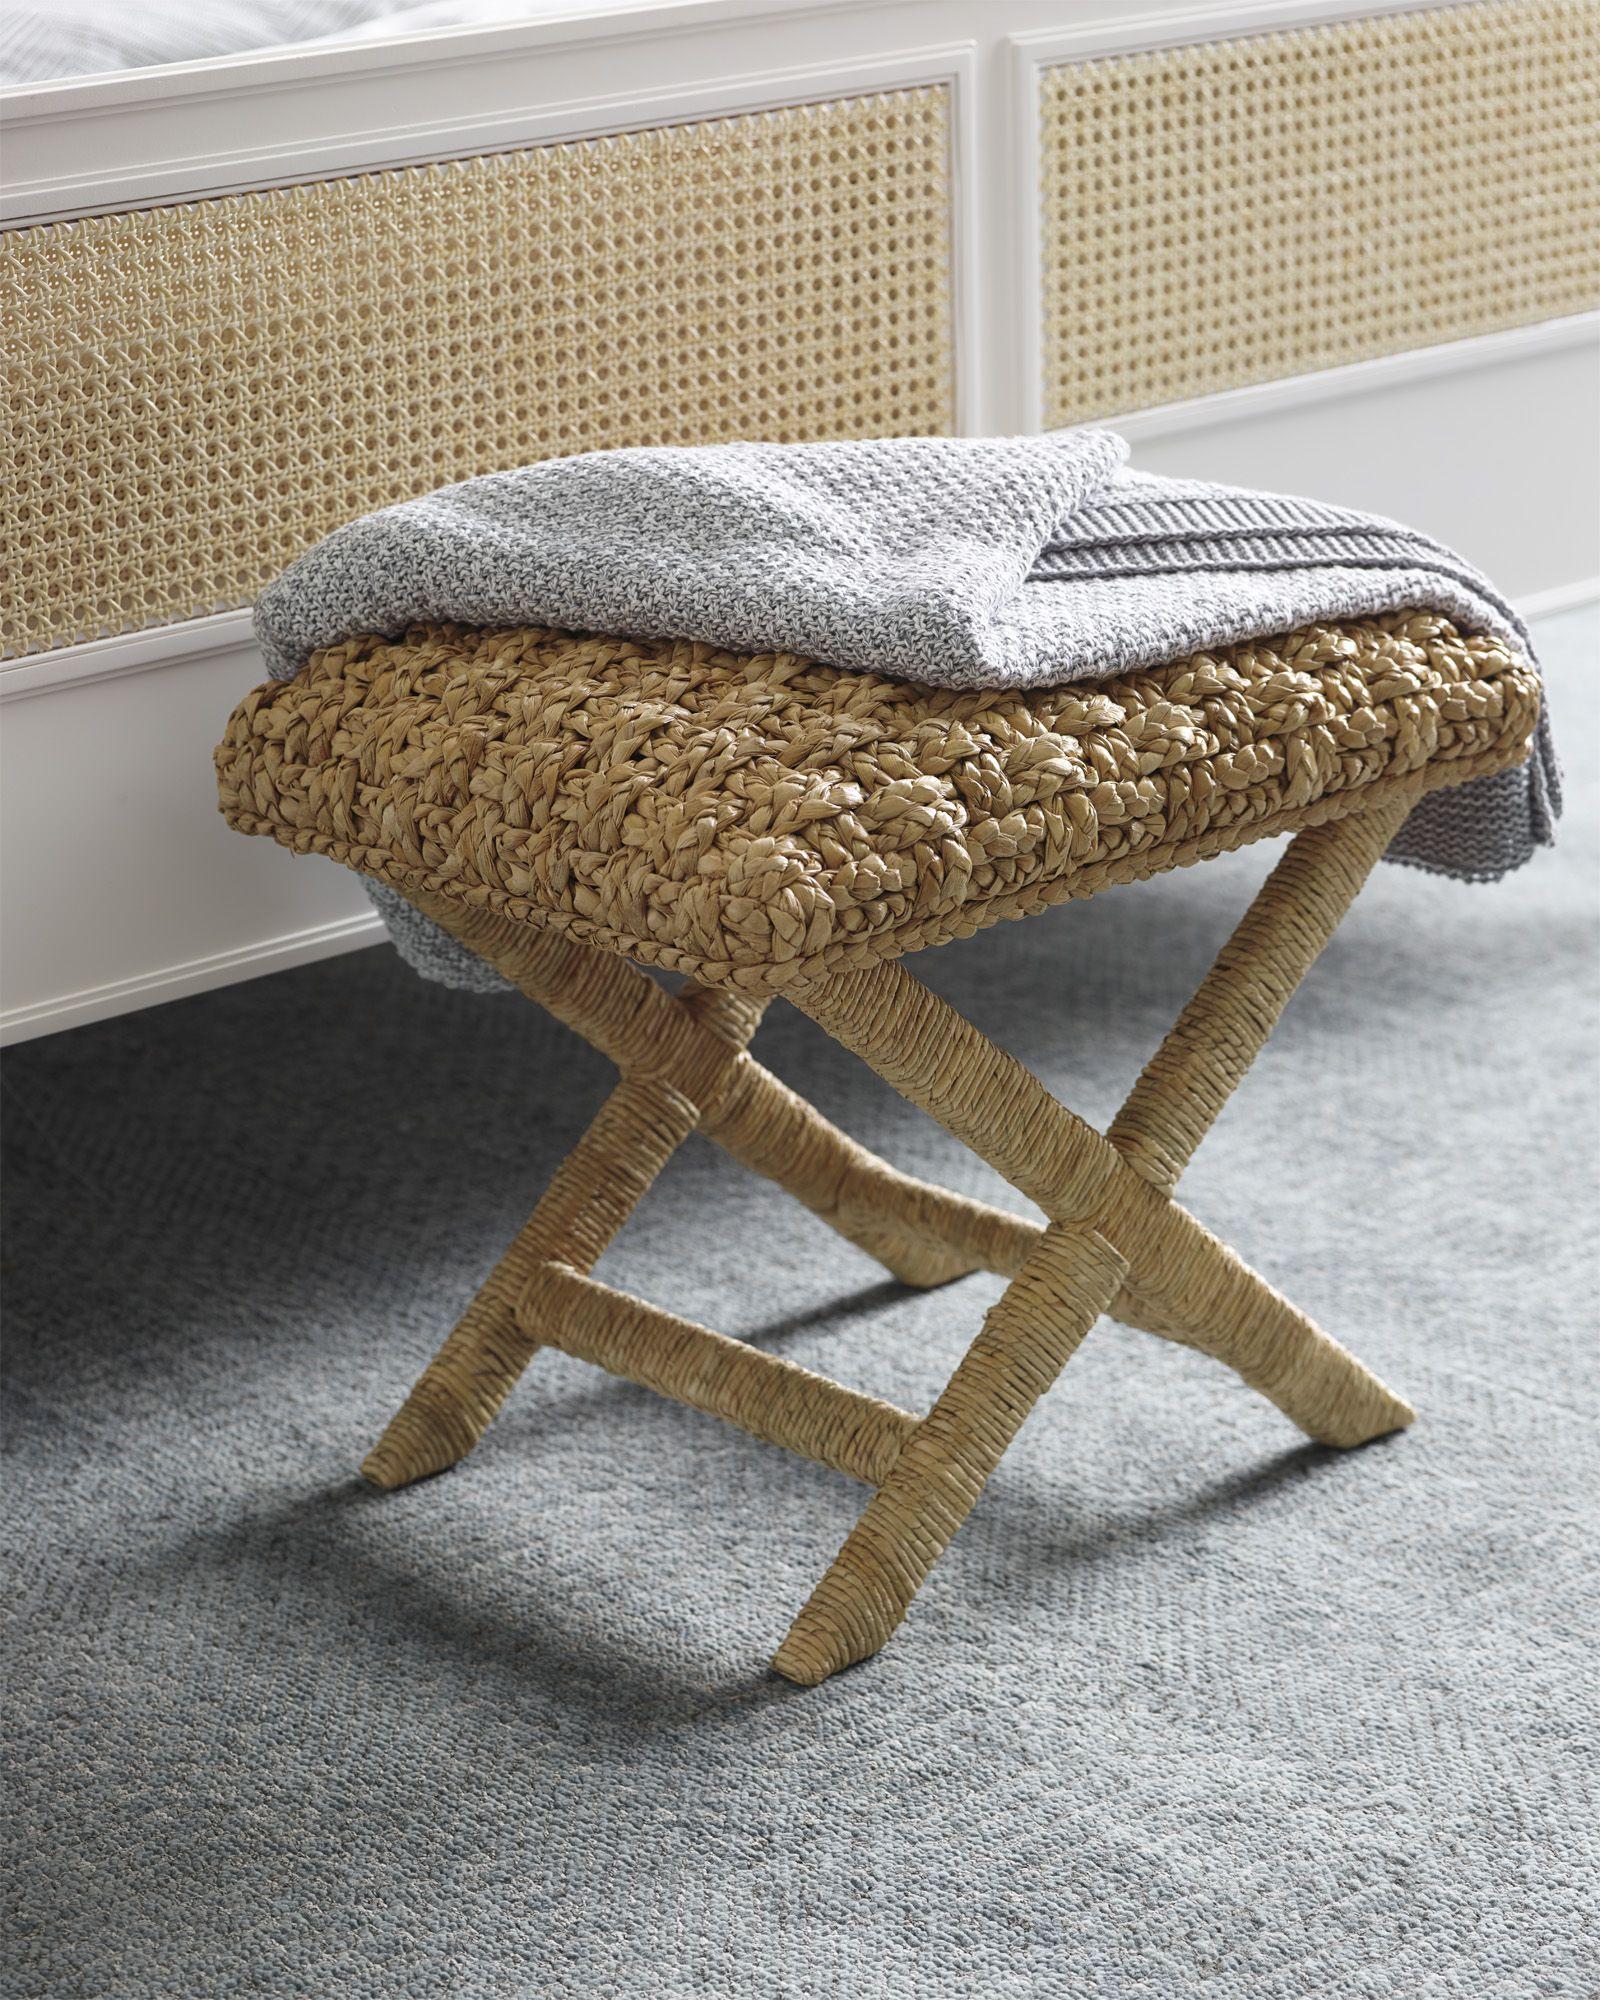 Costa X Base Stool Wicker Chair Cozy House Rattan Chair